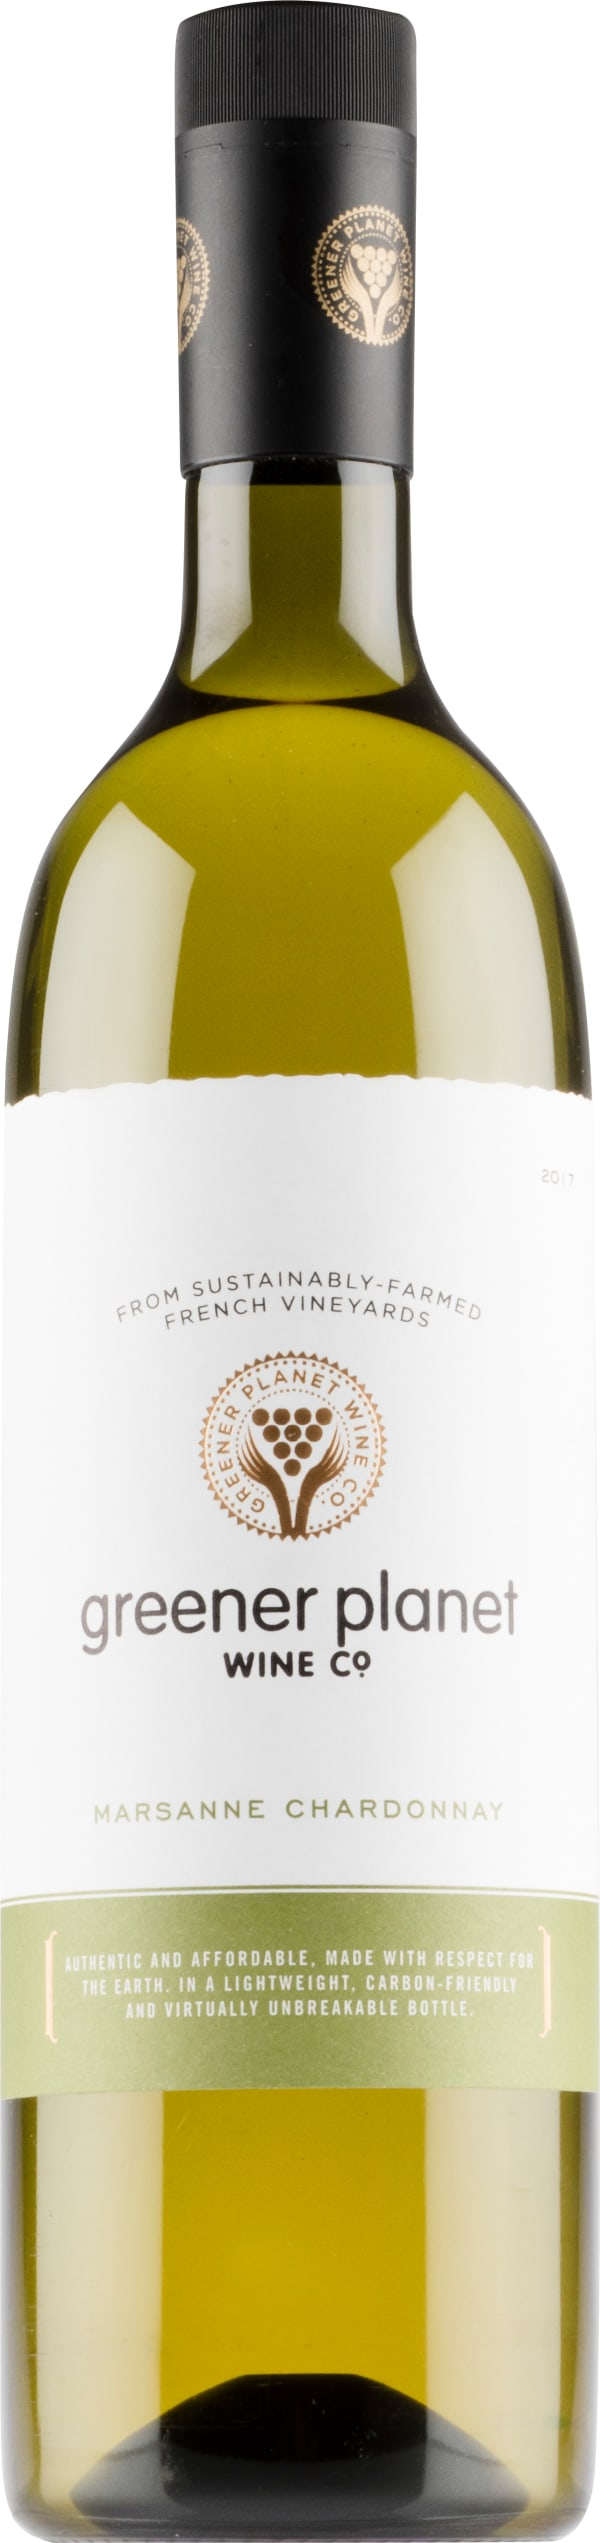 Greener Planet Marsanne Chardonnay 2017 plastflaska